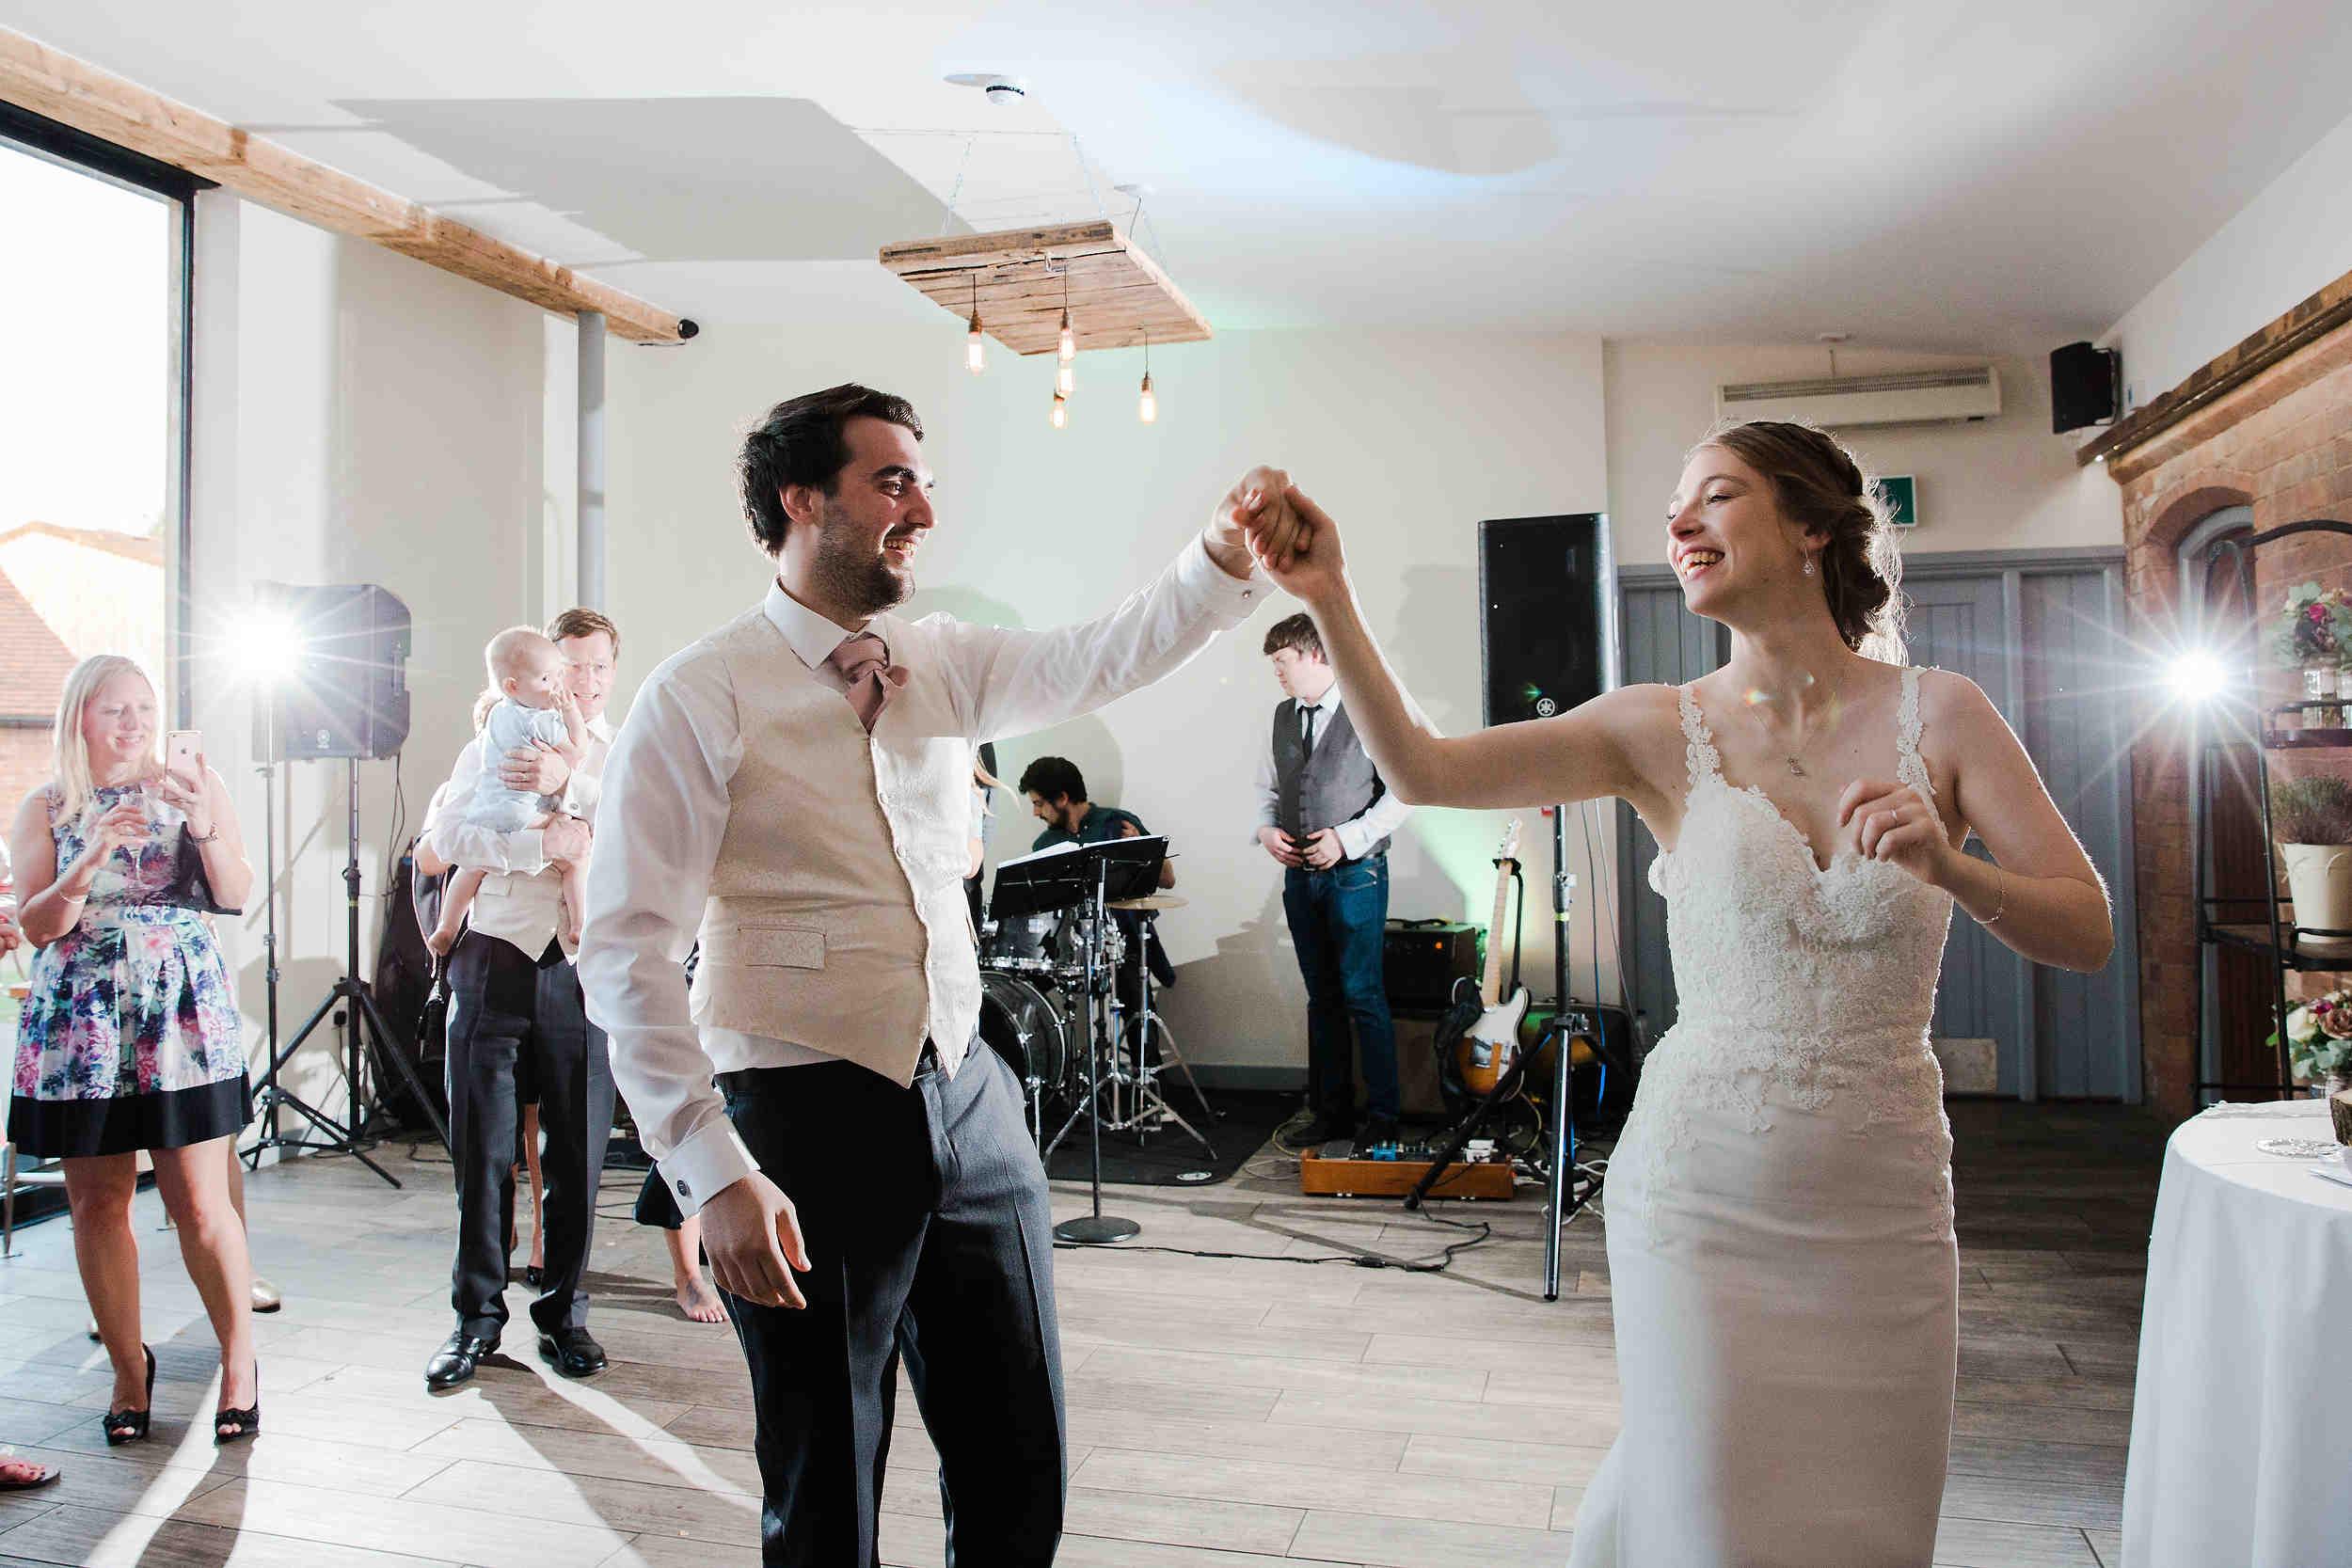 Modern_Stylish_Wedding_at_Swallows_Nest_Barn1305